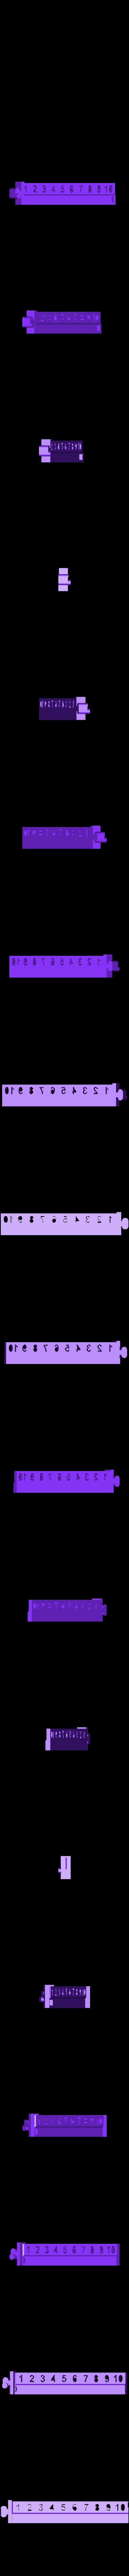 BeamR.stl Download free STL file Numerical Scale • 3D printable design, Duskwin